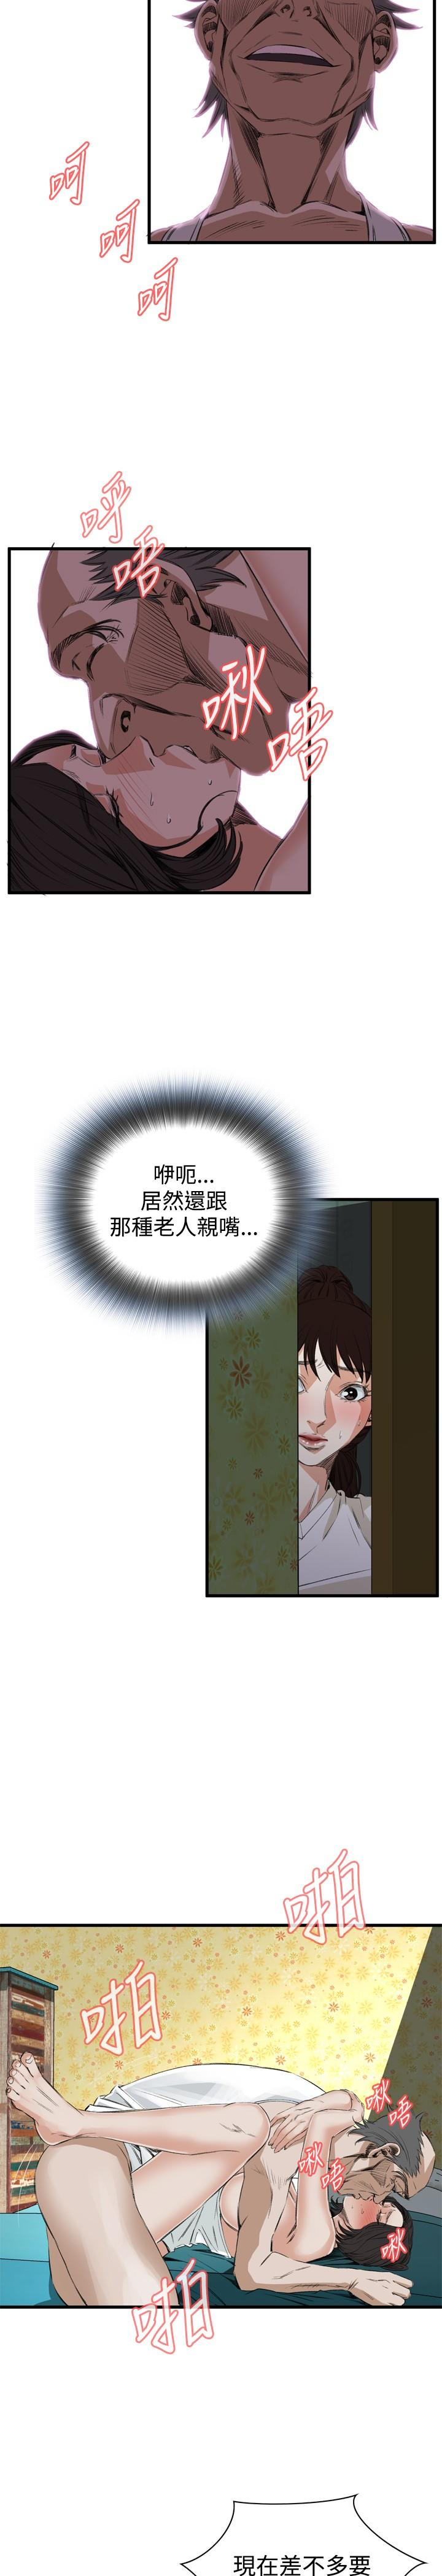 Take a Peek 偷窥 Ch.39~55 [Chinese]中文 167